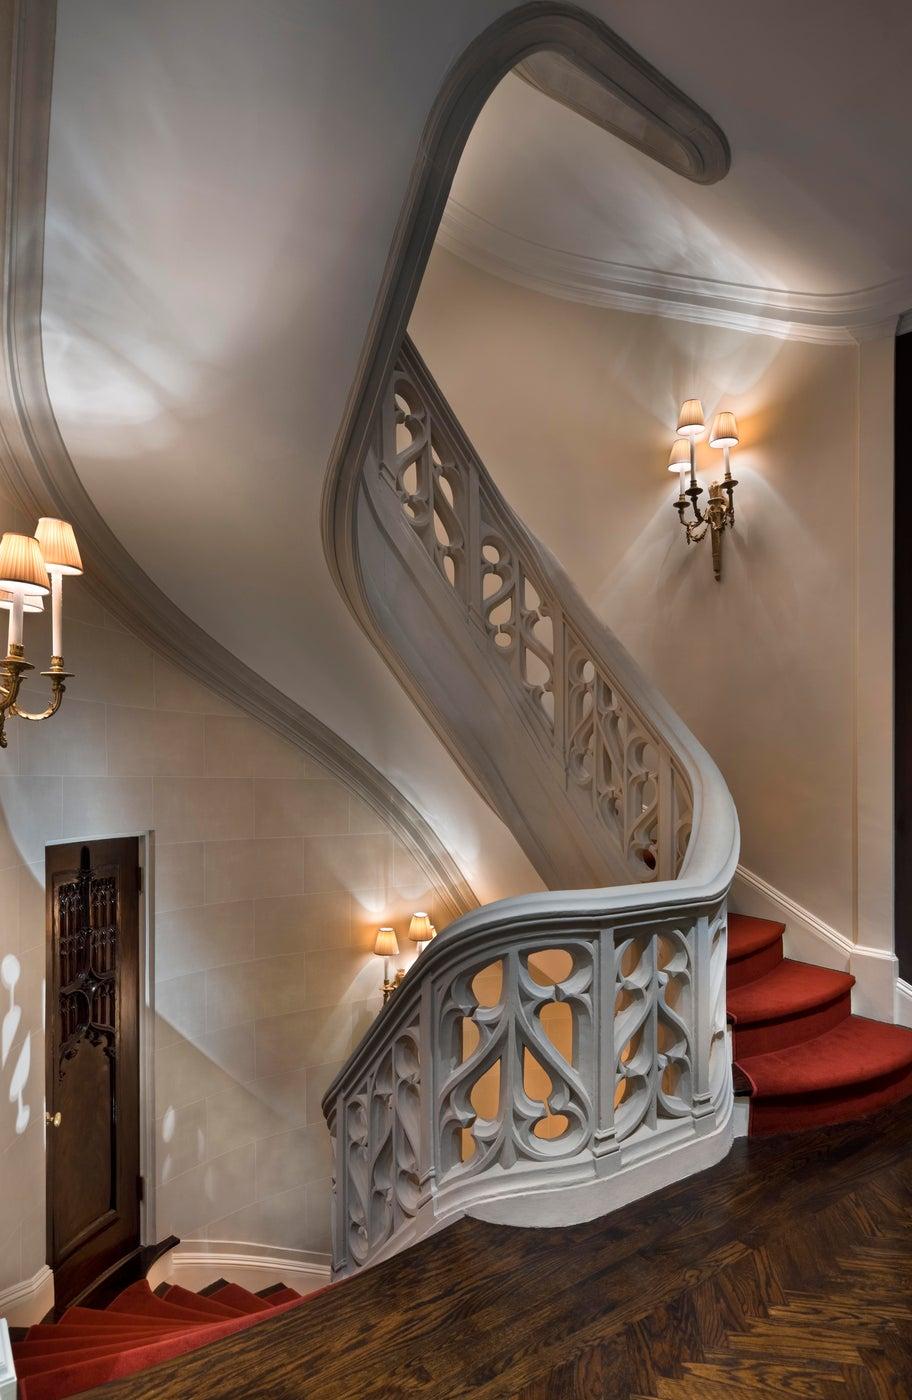 Historic New York City Townhouse Major Renovation - Staircase